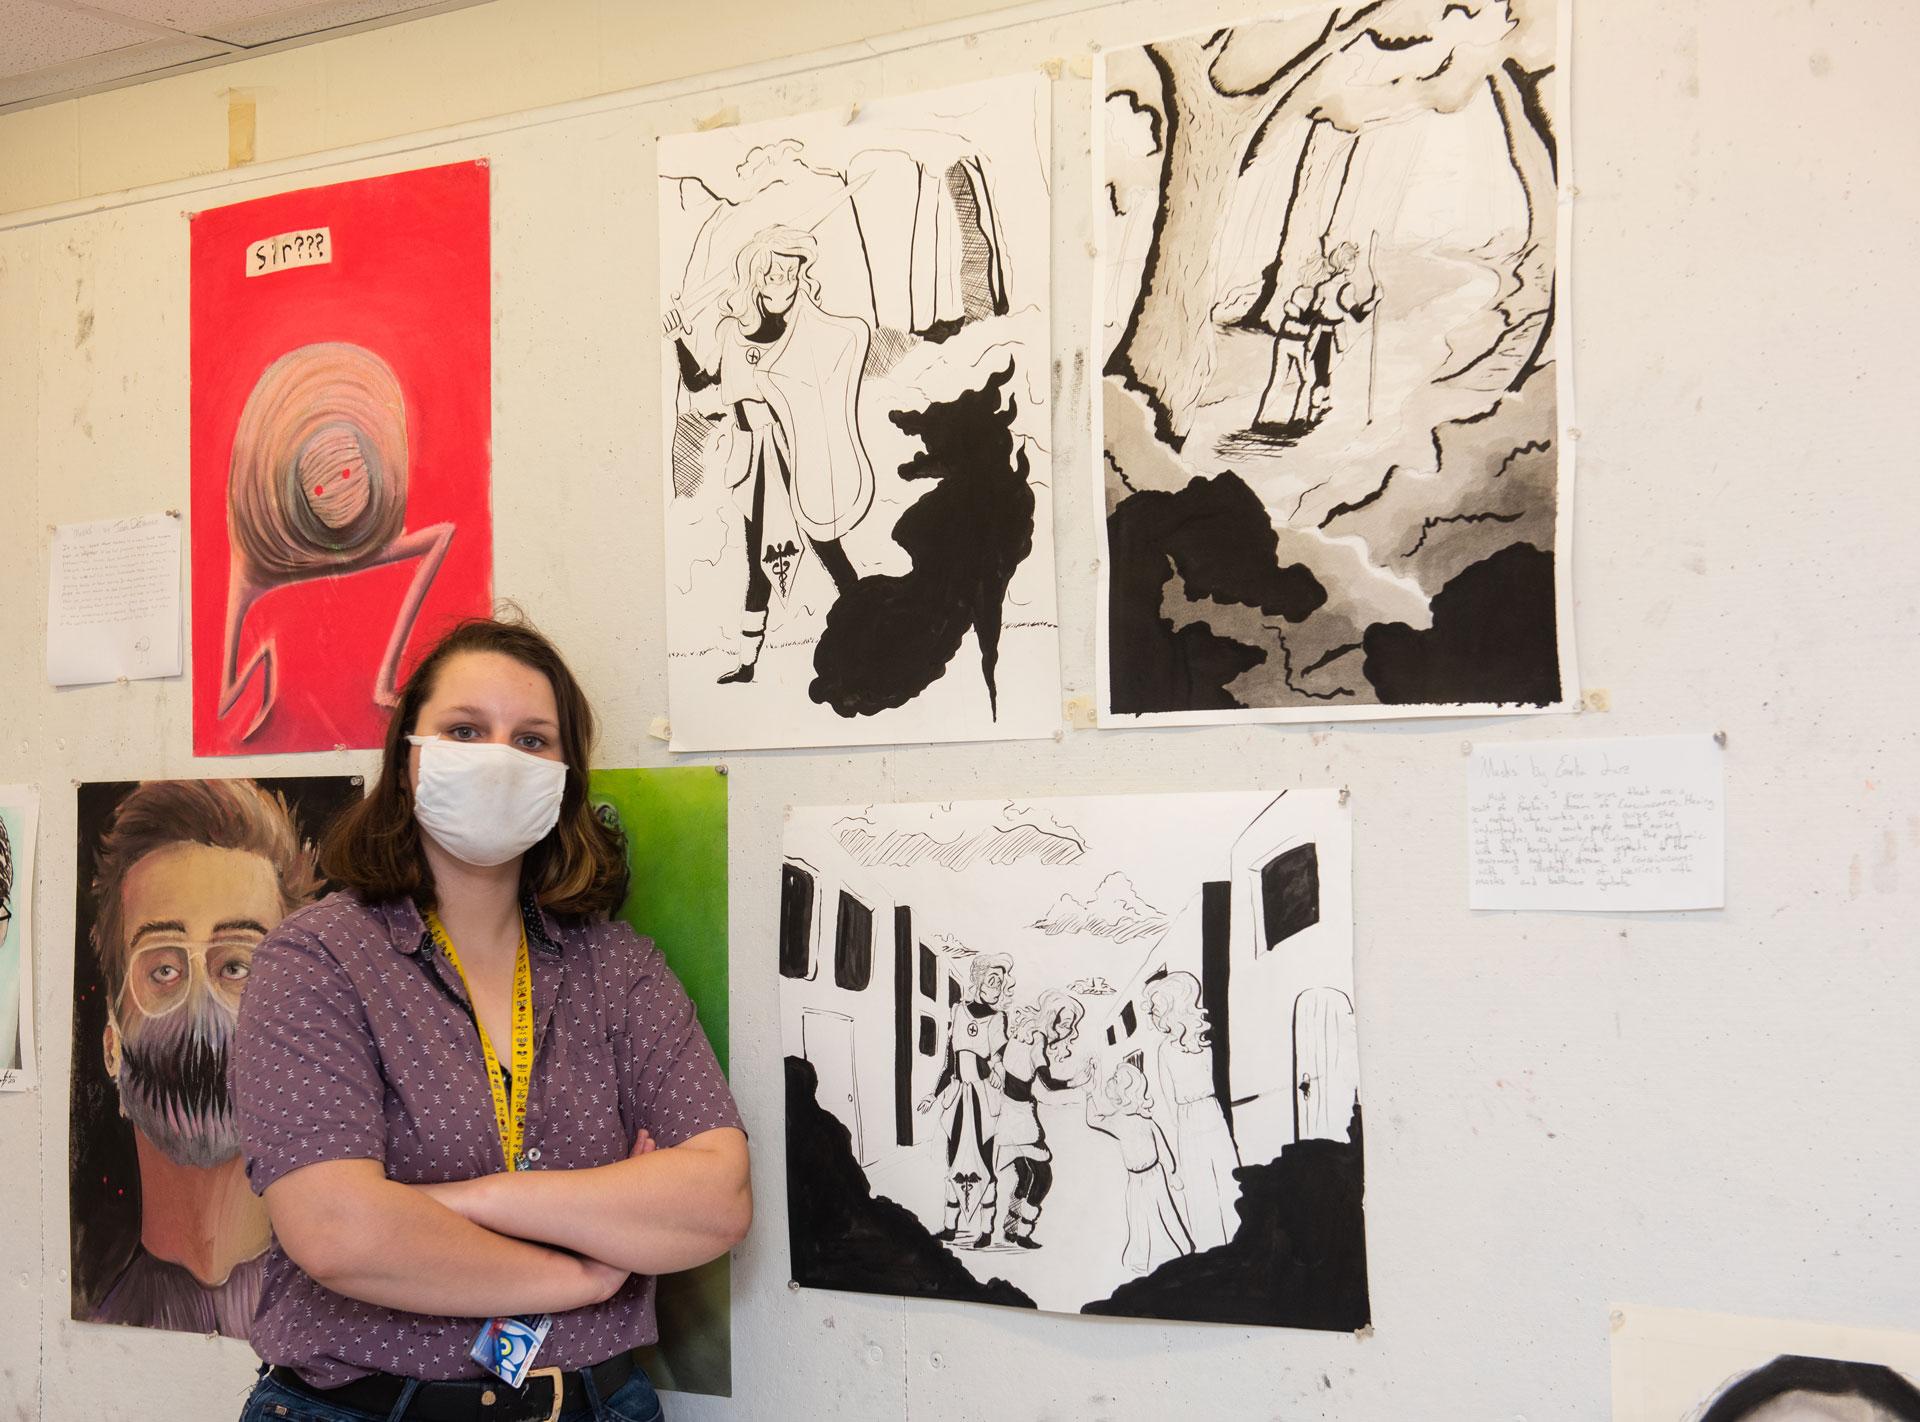 portrait of SCSU student artist Emilia Luz with her work